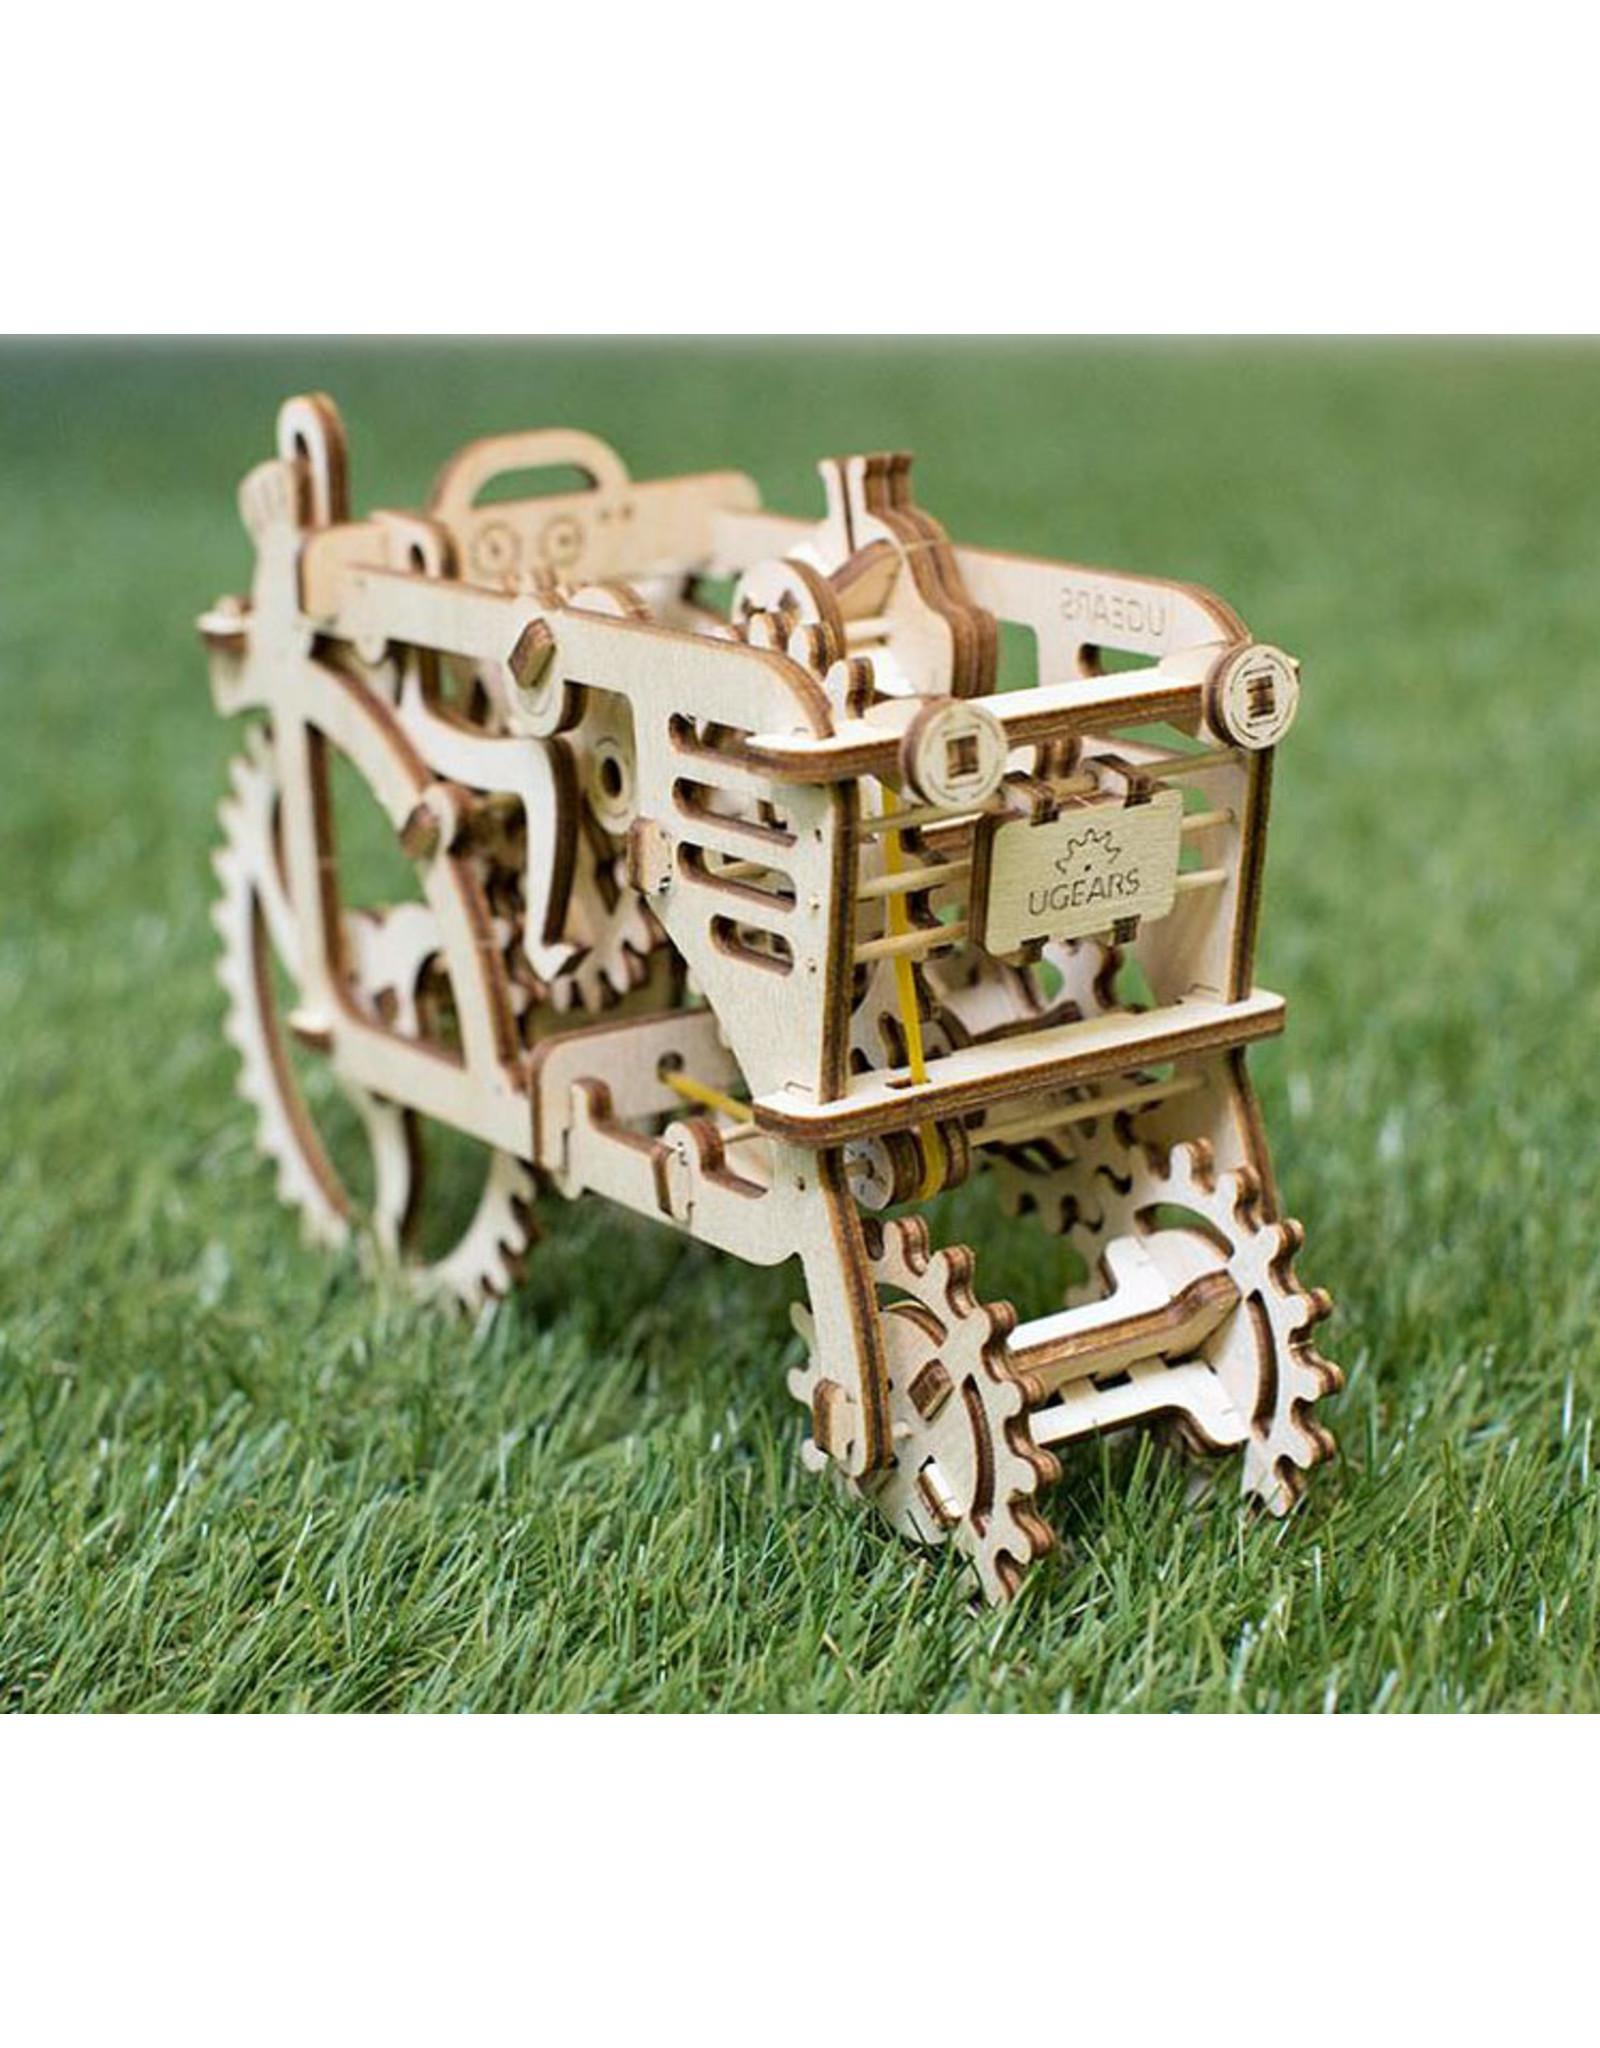 Ugears mechanische 3D-bouwpakketten Tractor (mechanisch houten 3D-bouwpakket)